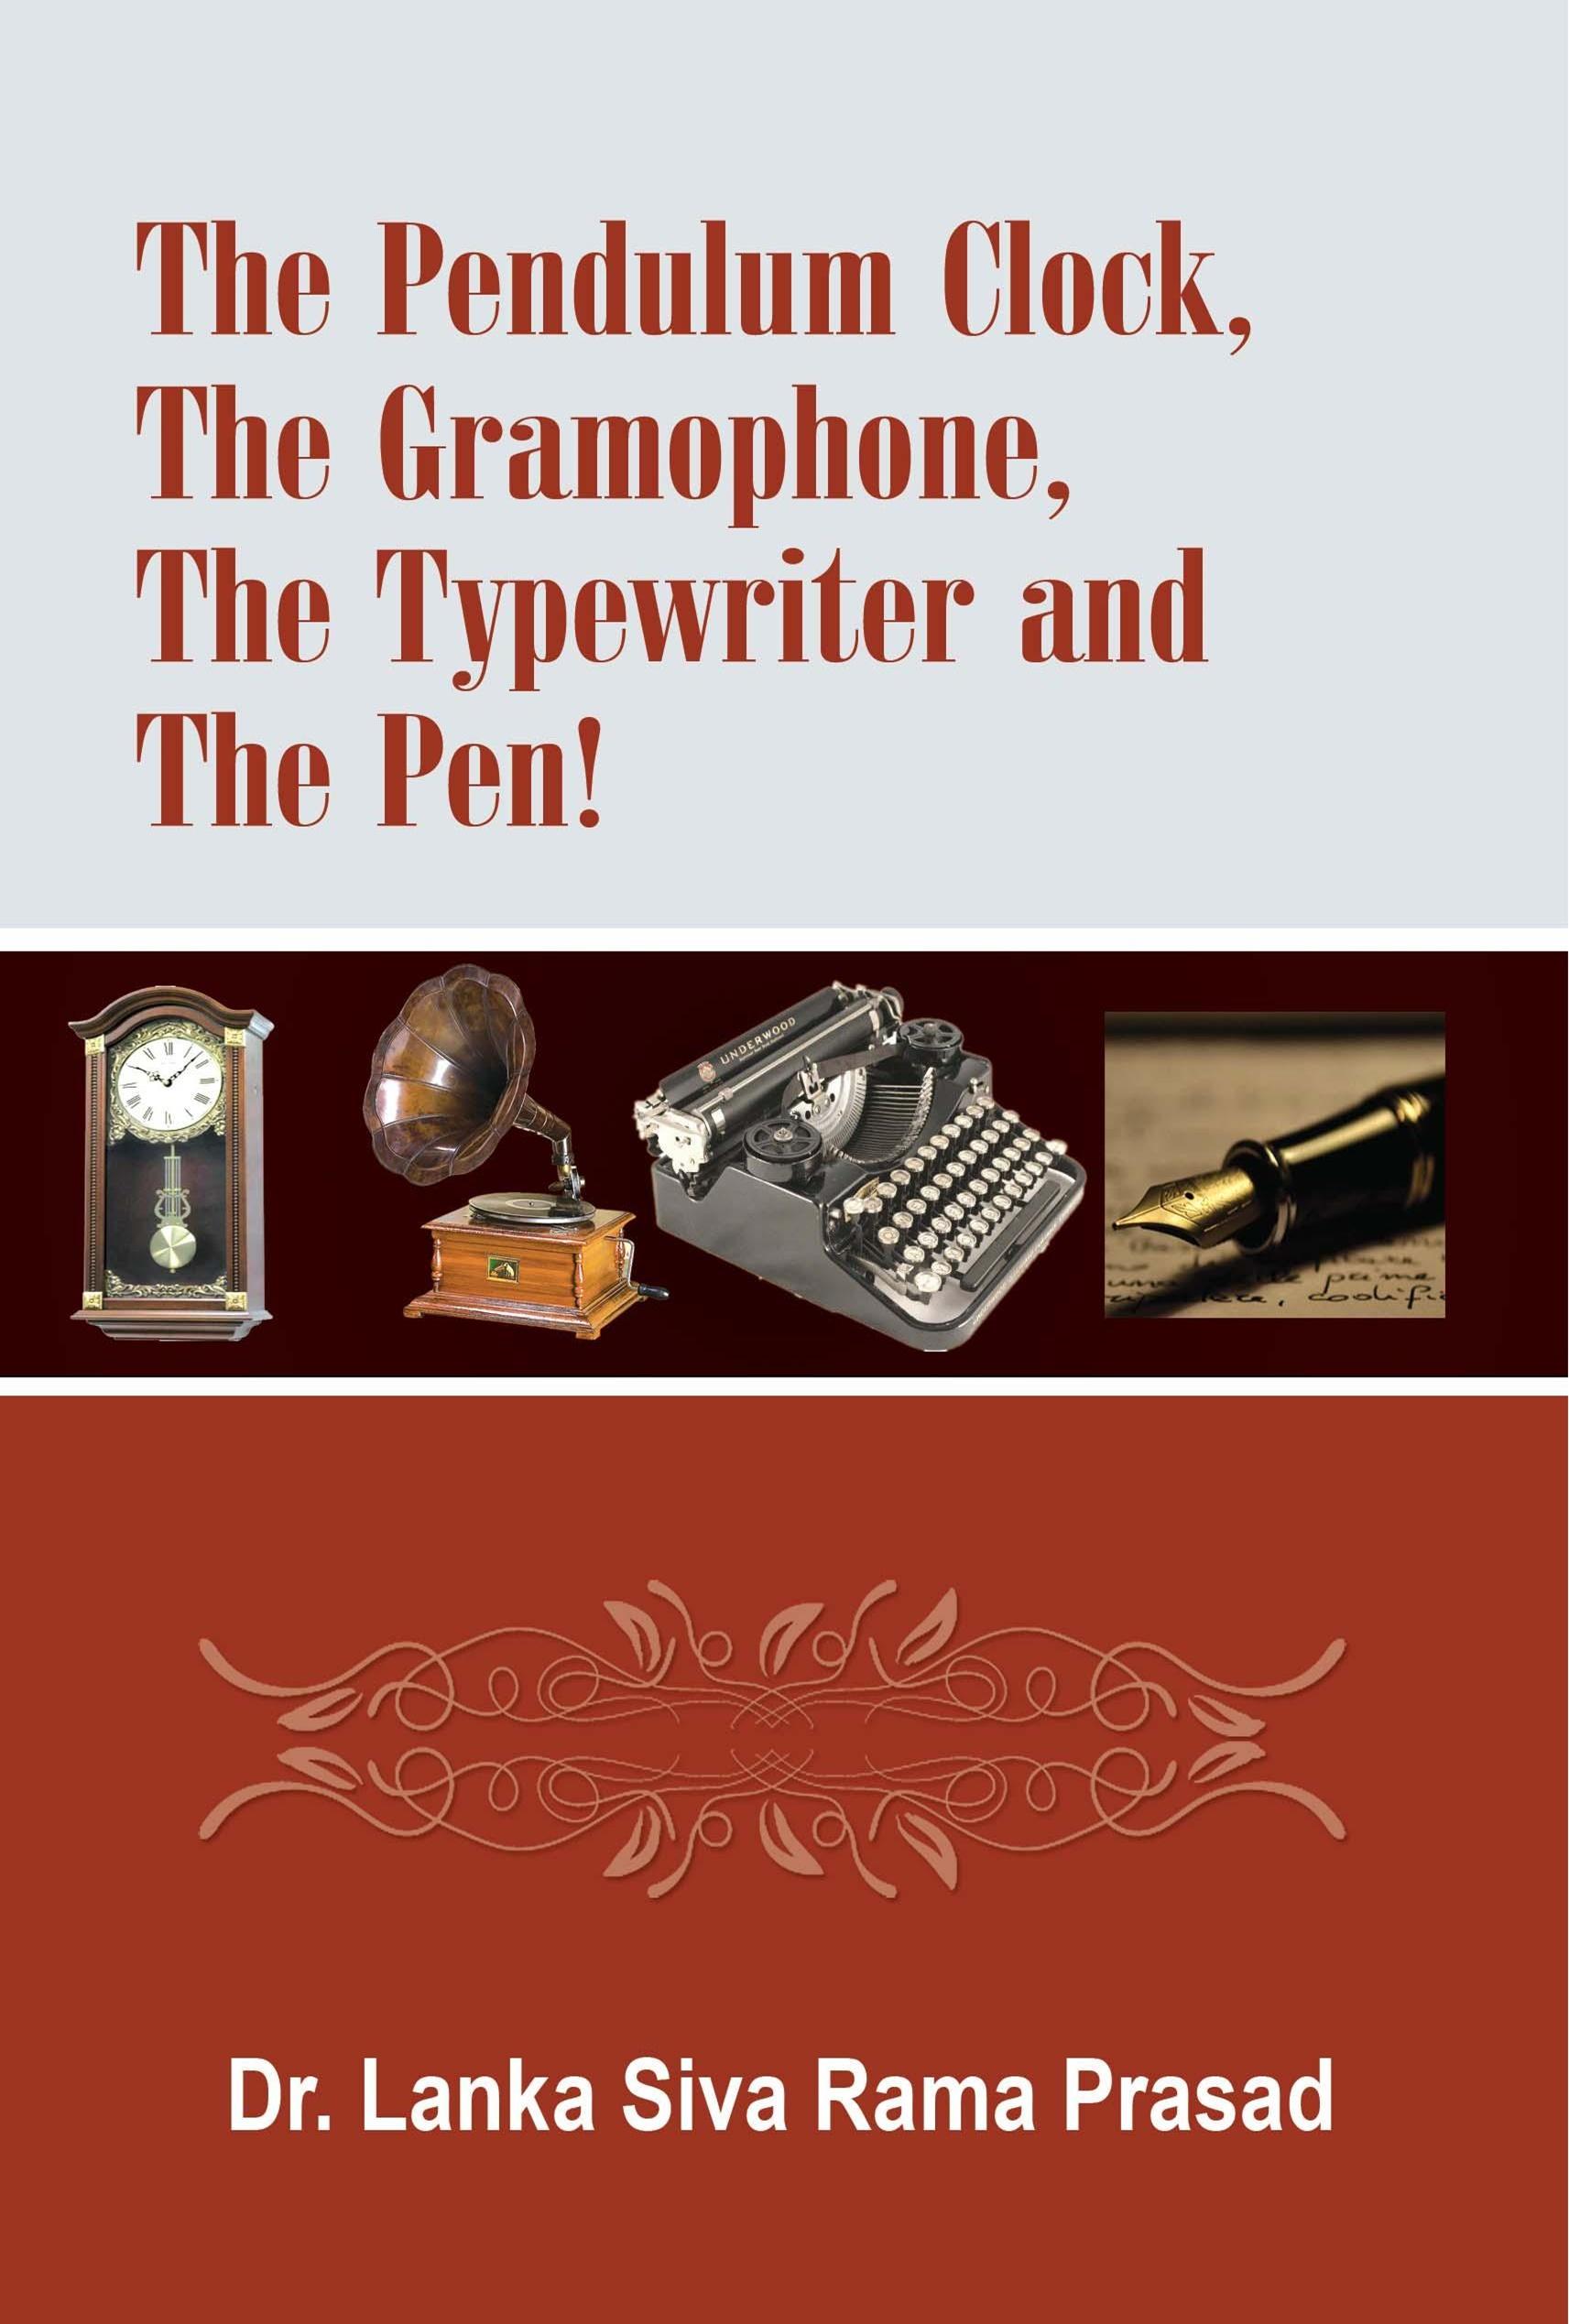 The Pendulum Clock, The Gramophone, The